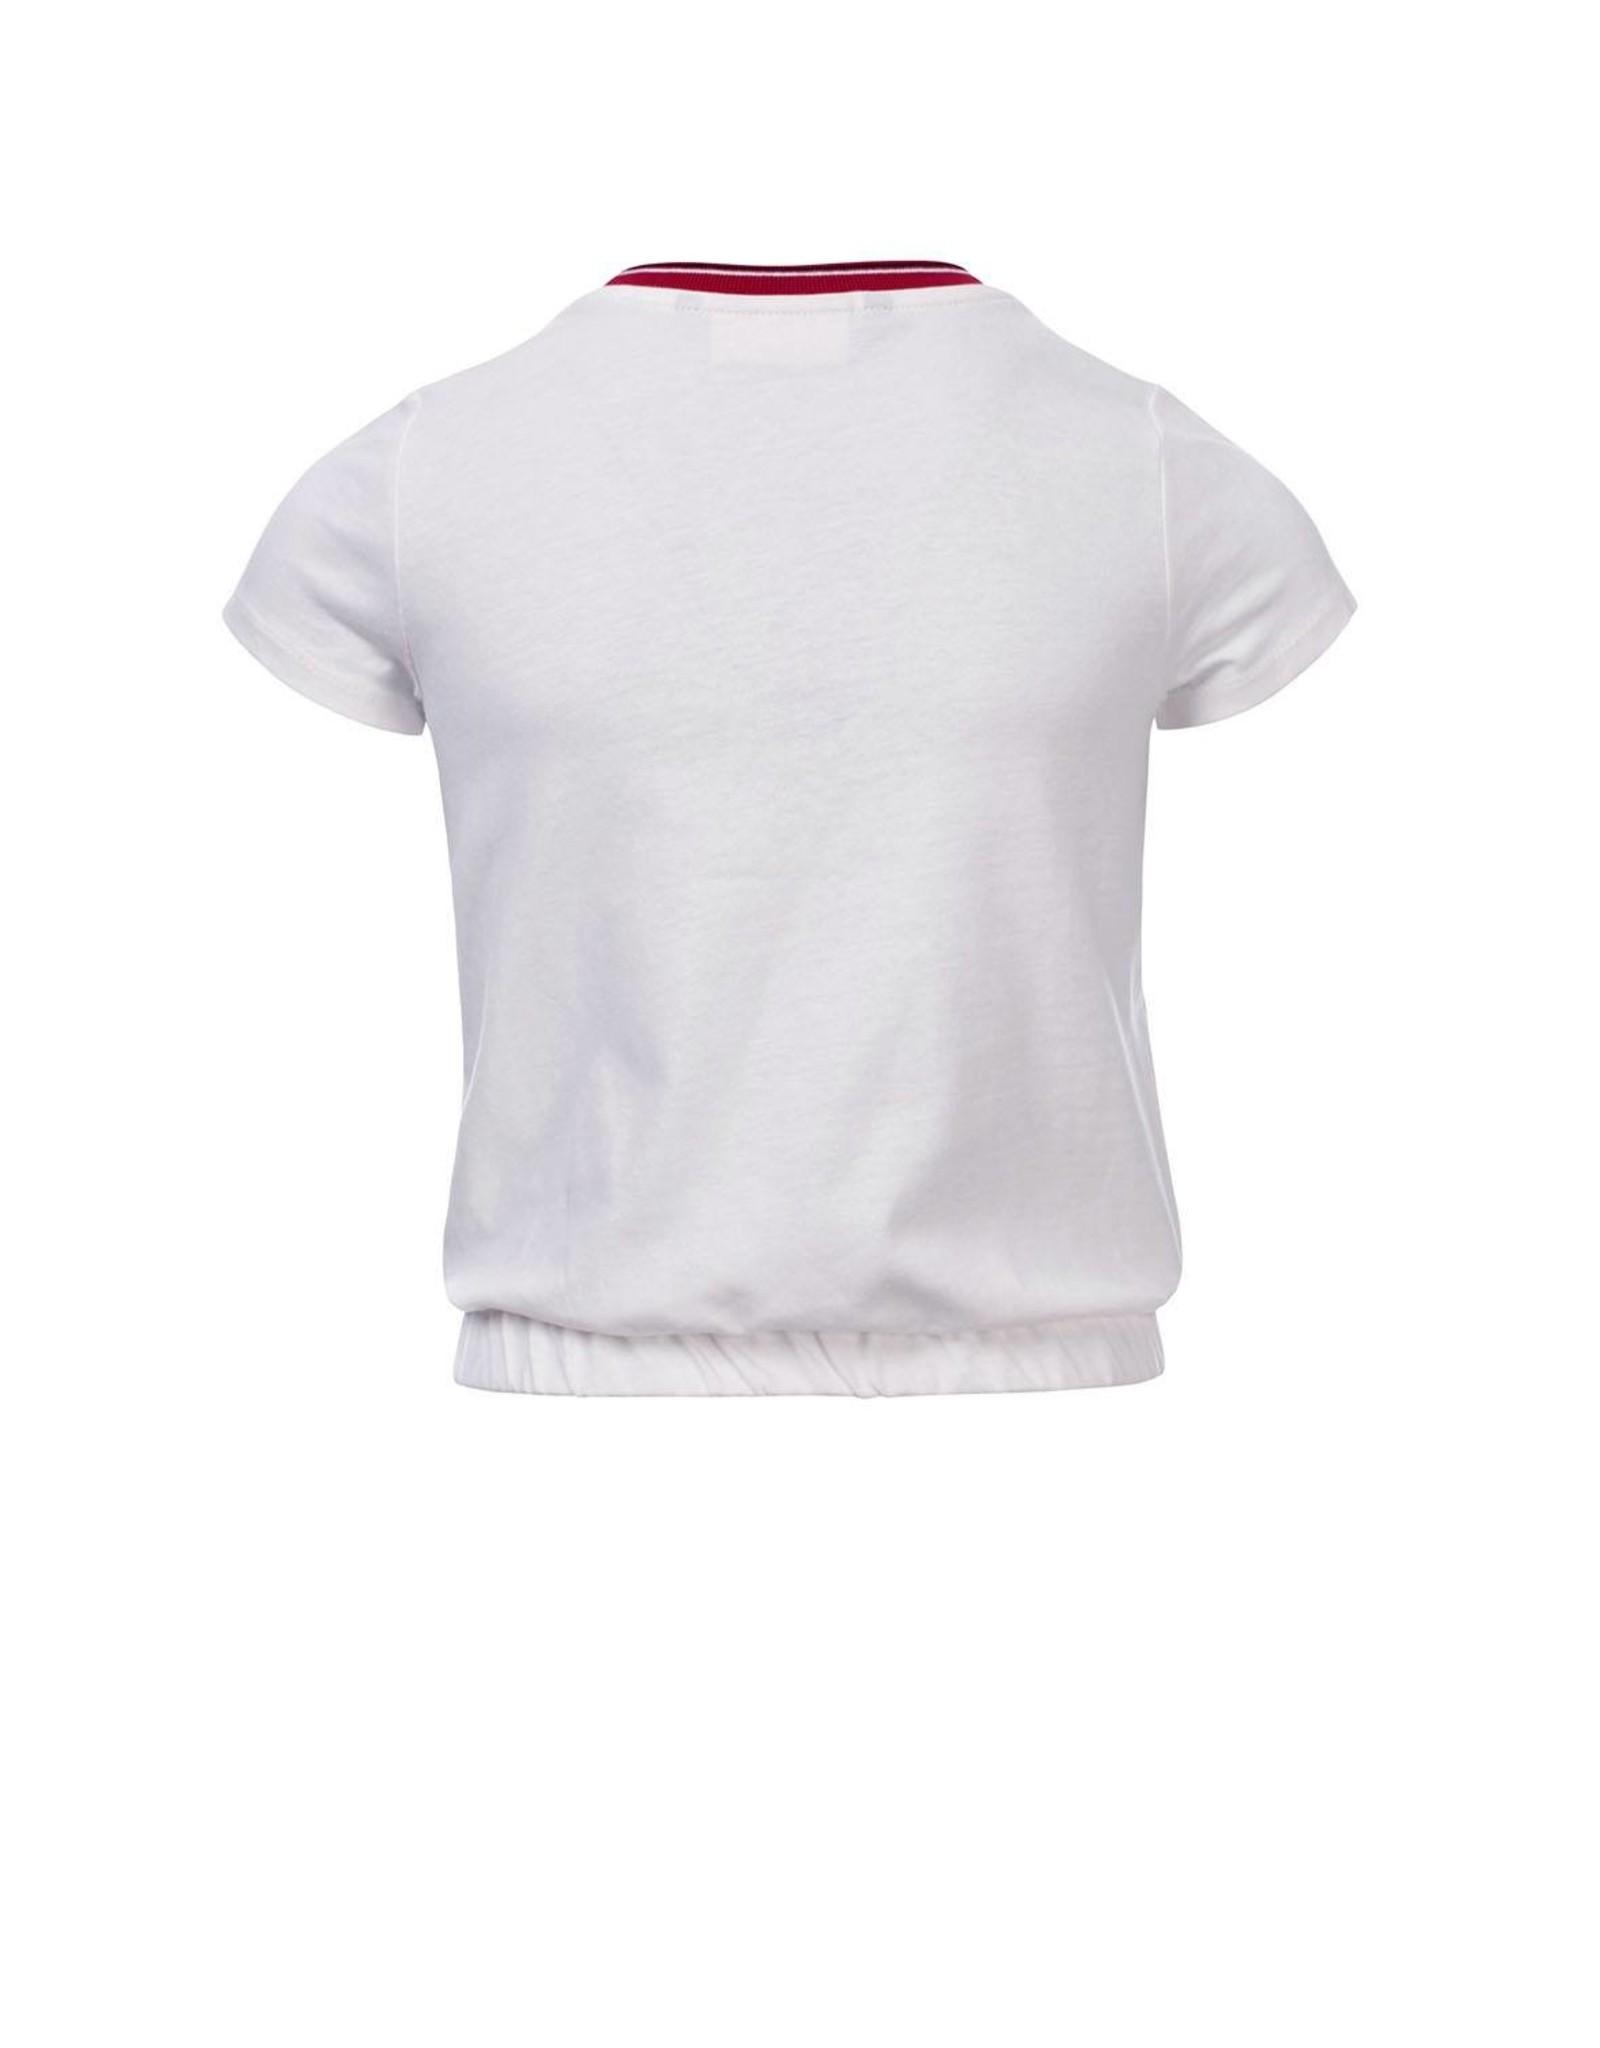 Looxs 10SIXTEEN 10Sixteen T-shirt white lilly